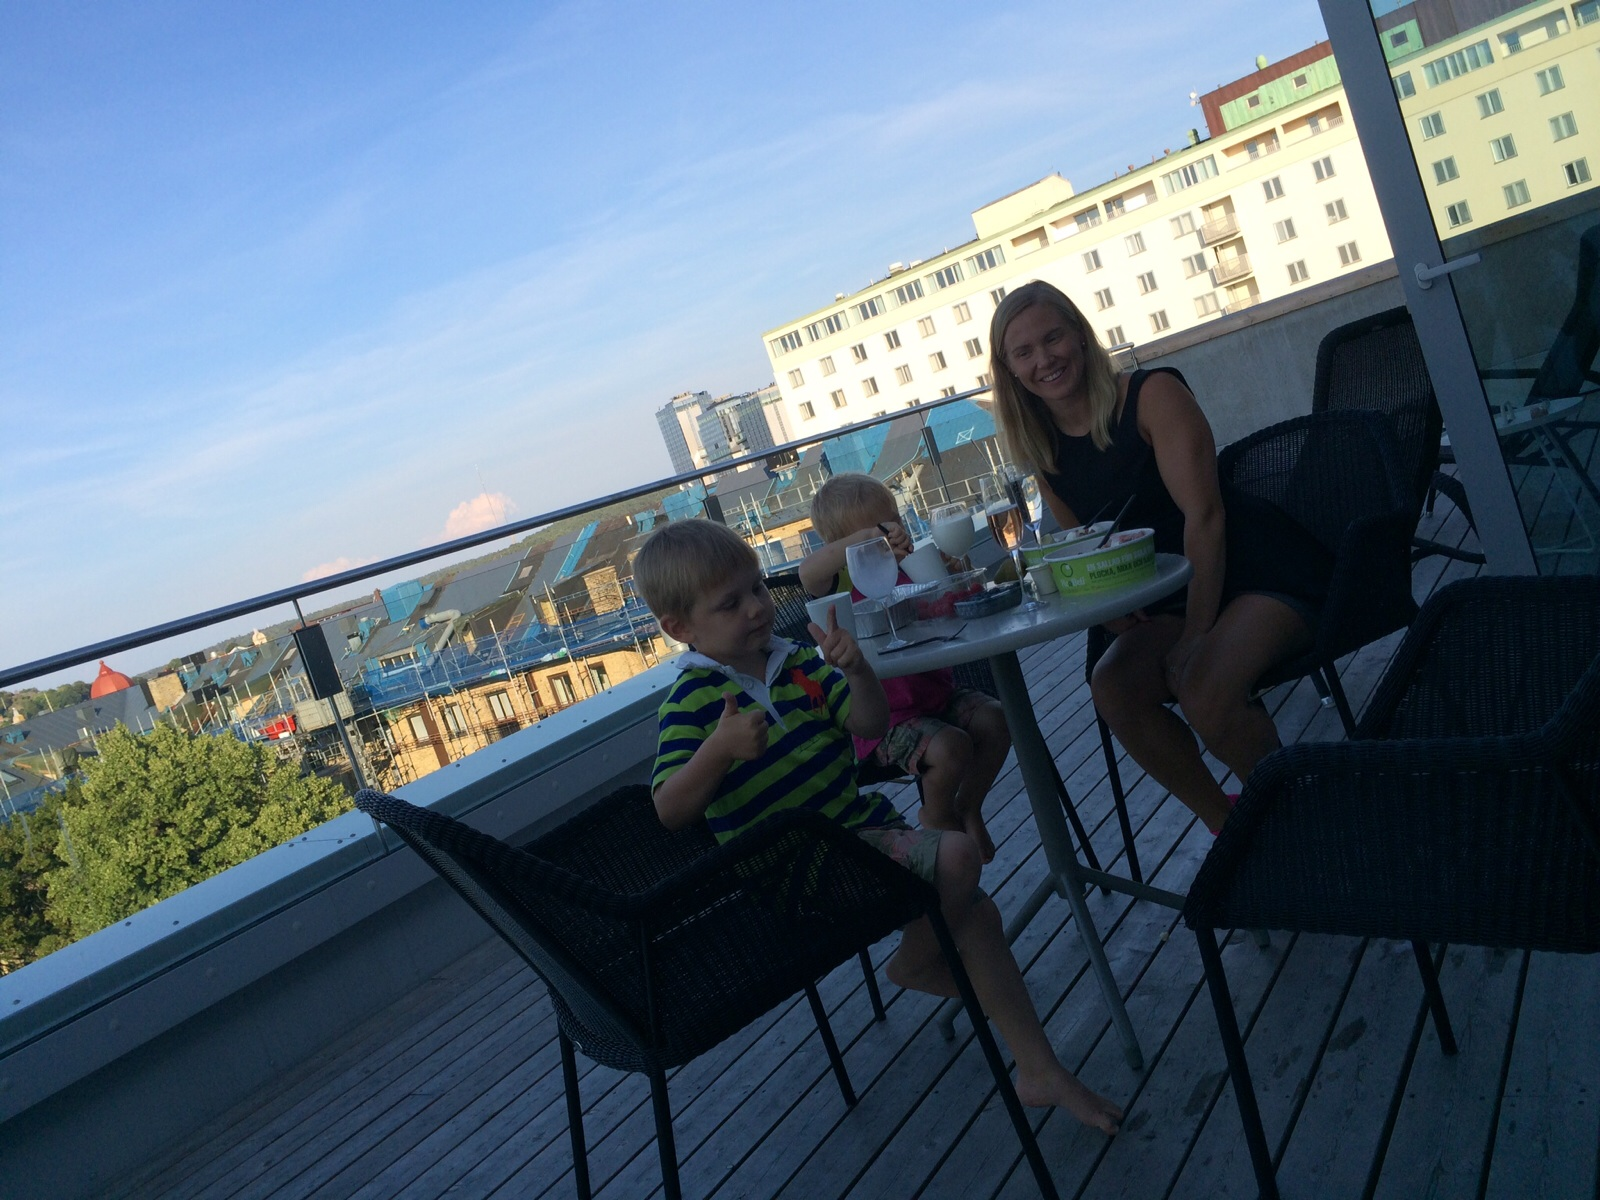 middag internet brudar litet bröst i Göteborg